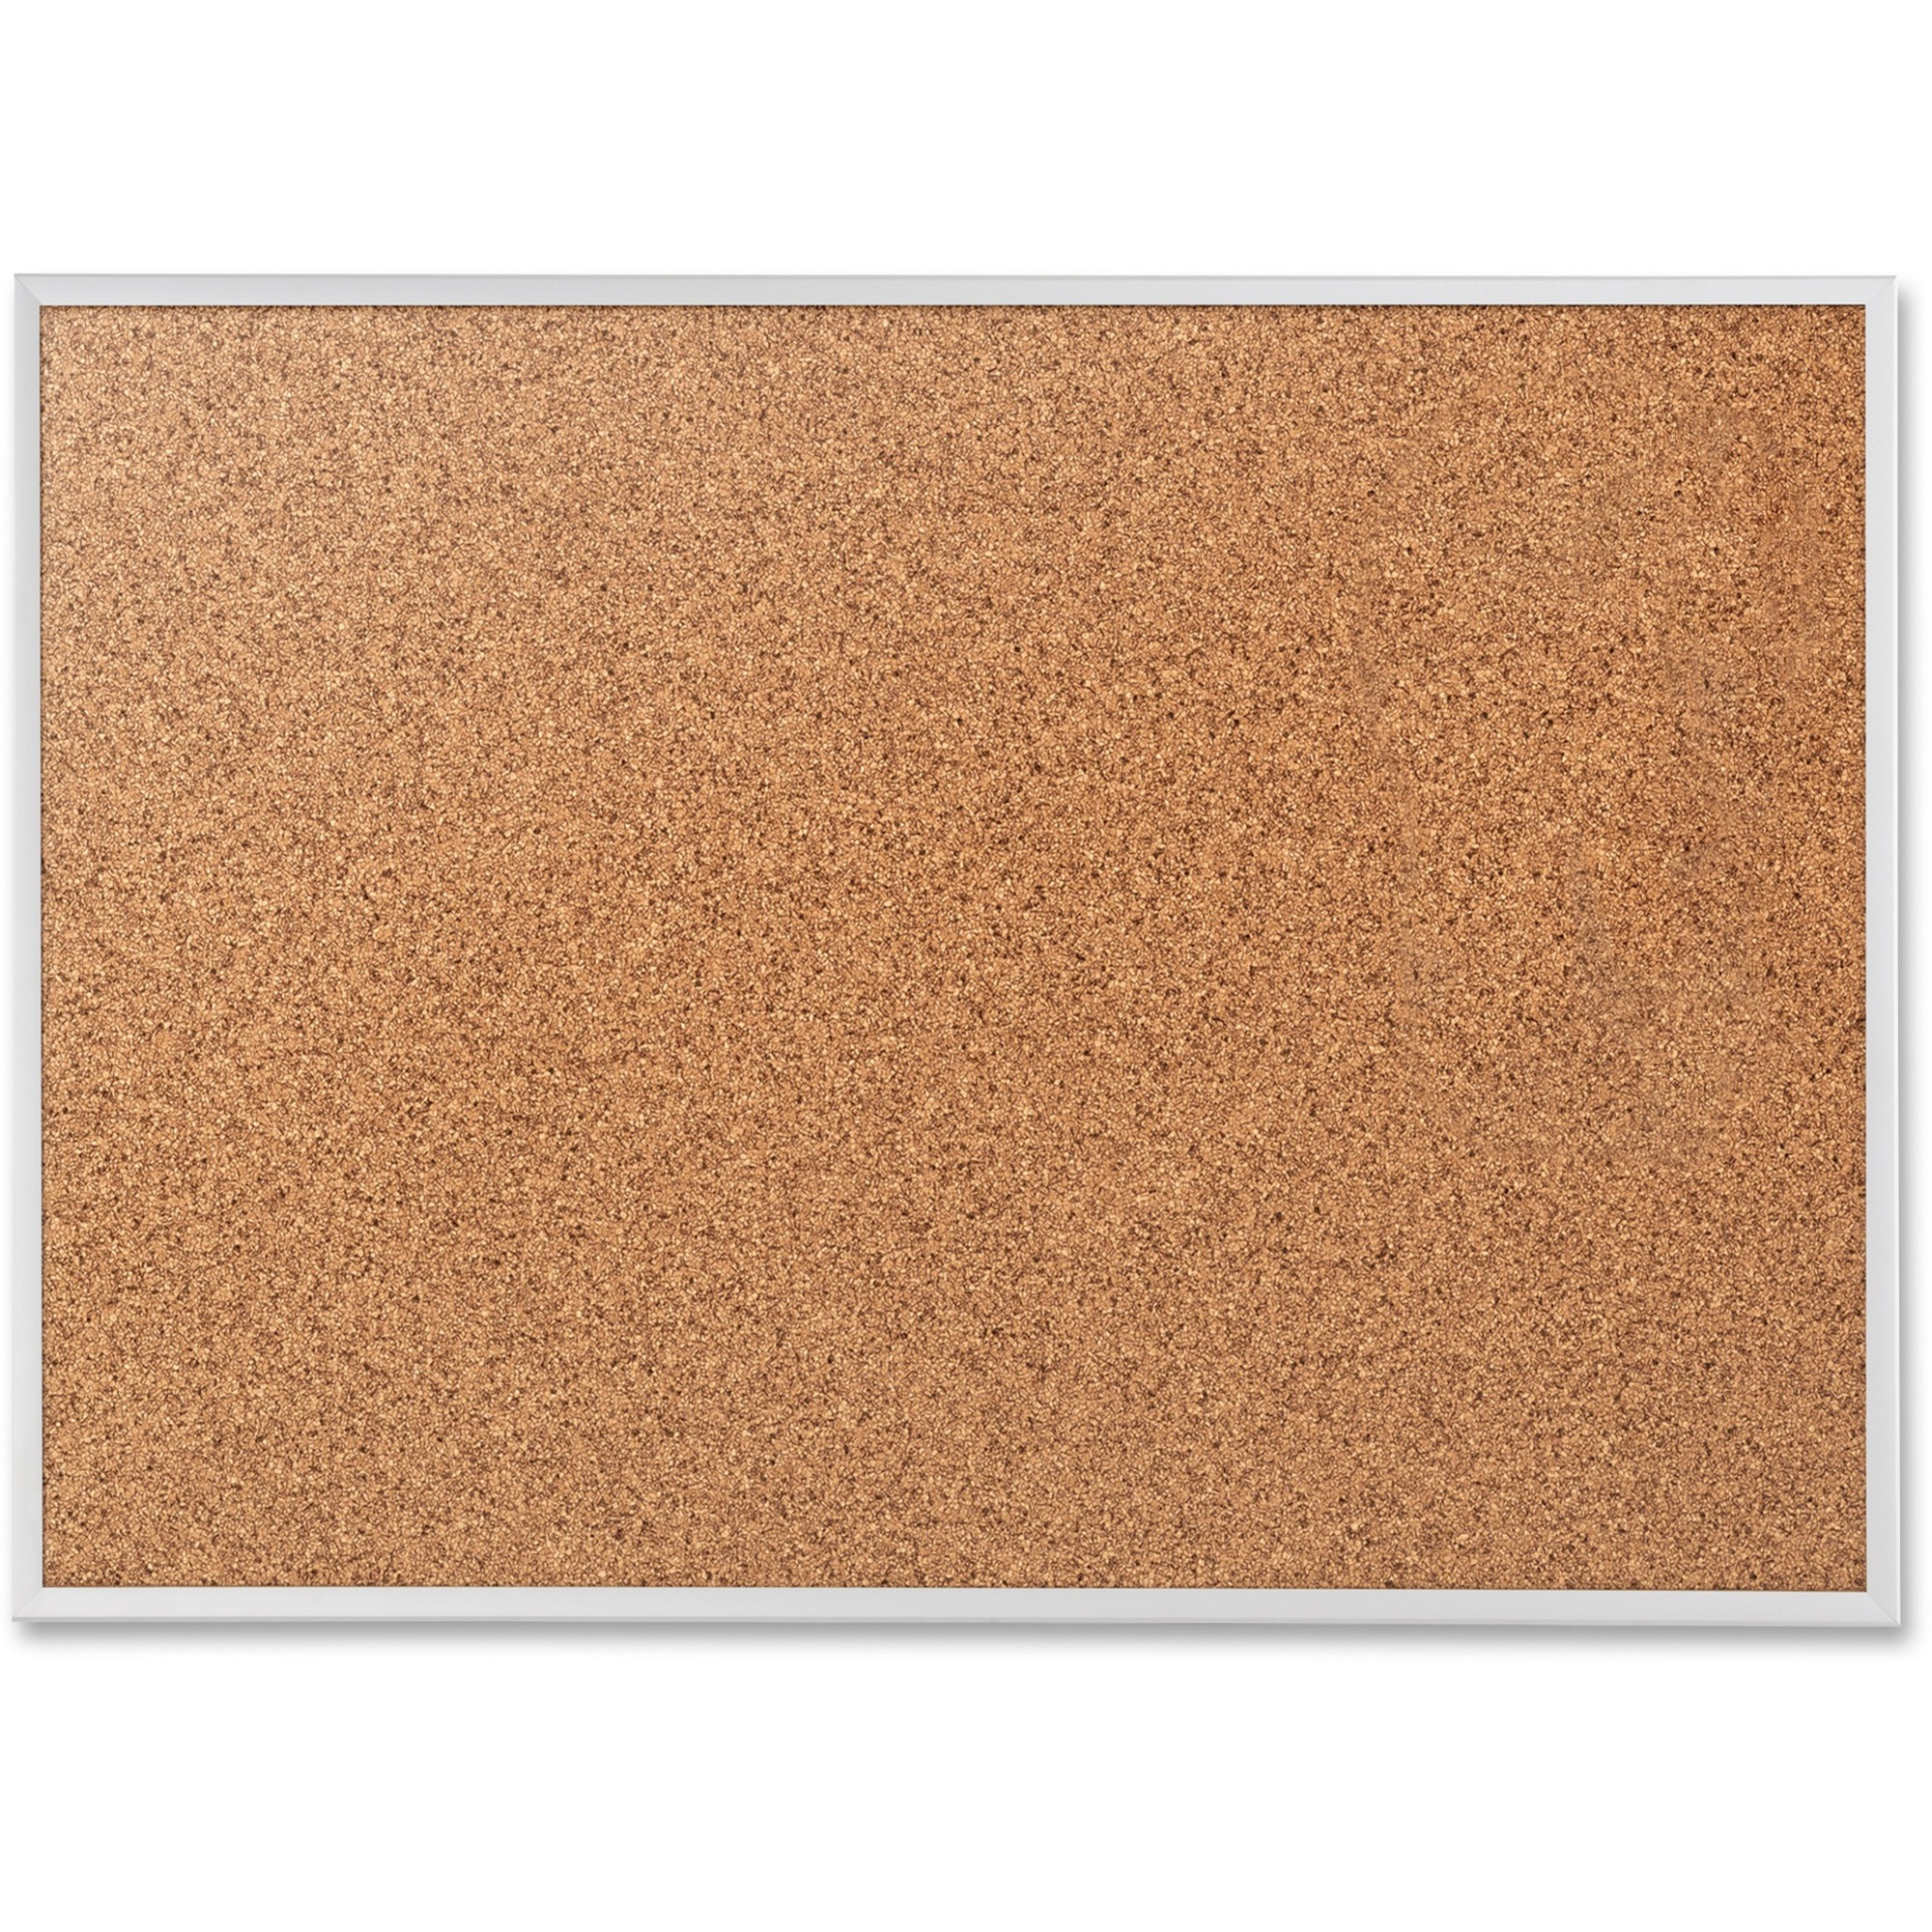 Acco Brands Corporation Quartet® Classic Cork Bulletin Board - 36 Height X 48 Width - Brown Natural Cork Surface - Silver Aluminum Frame - 1 Each